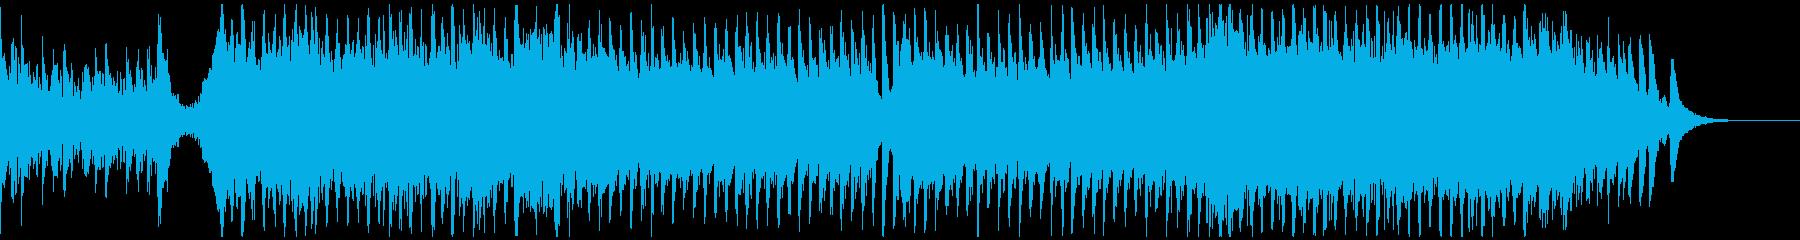 PR、CM、華麗なる衝撃、オーケストラSの再生済みの波形